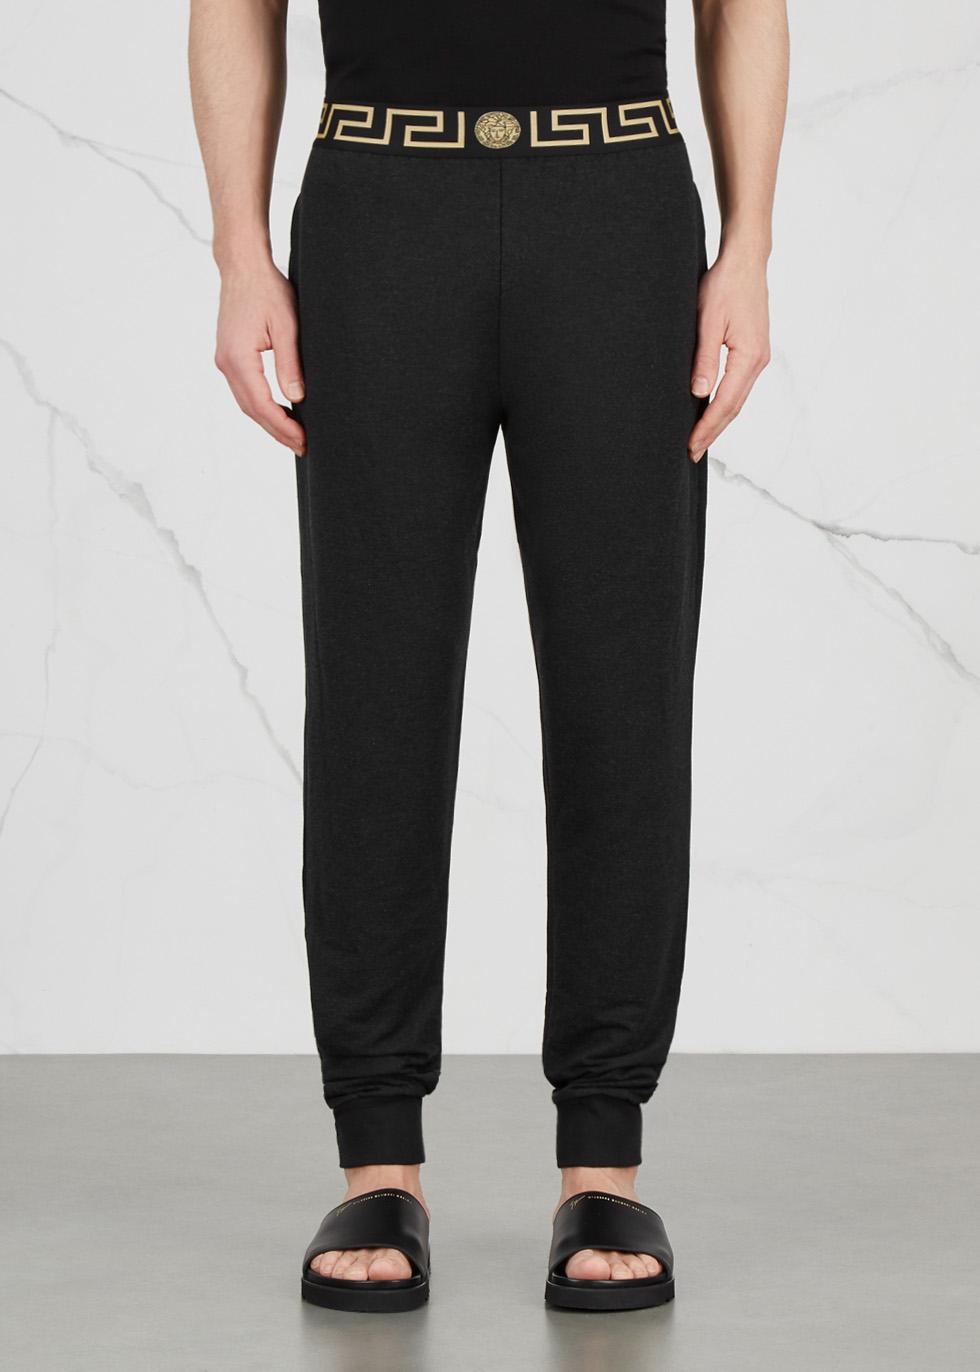 Black modal blend jogging trousers - Versace